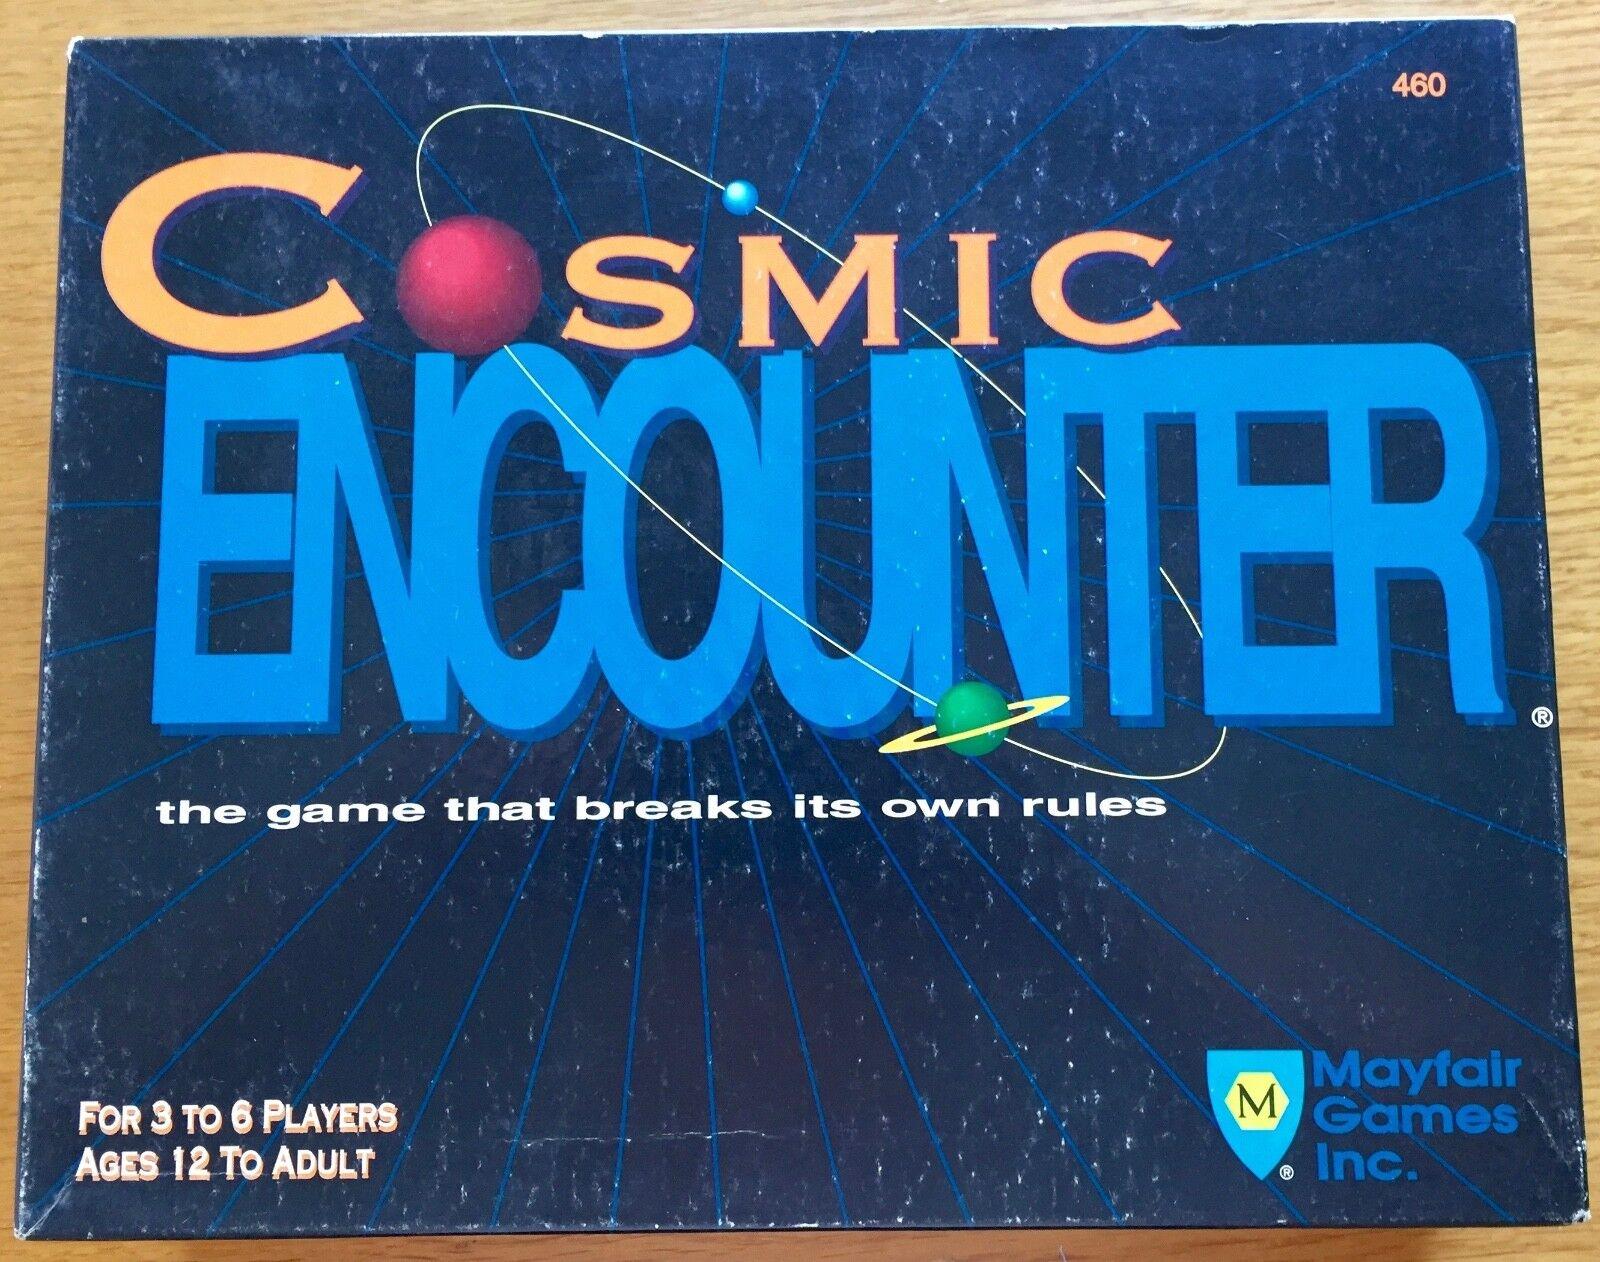 Cosmic Encounter - Mayfair Games 1991 - Pedine staccate ma mai giocato.